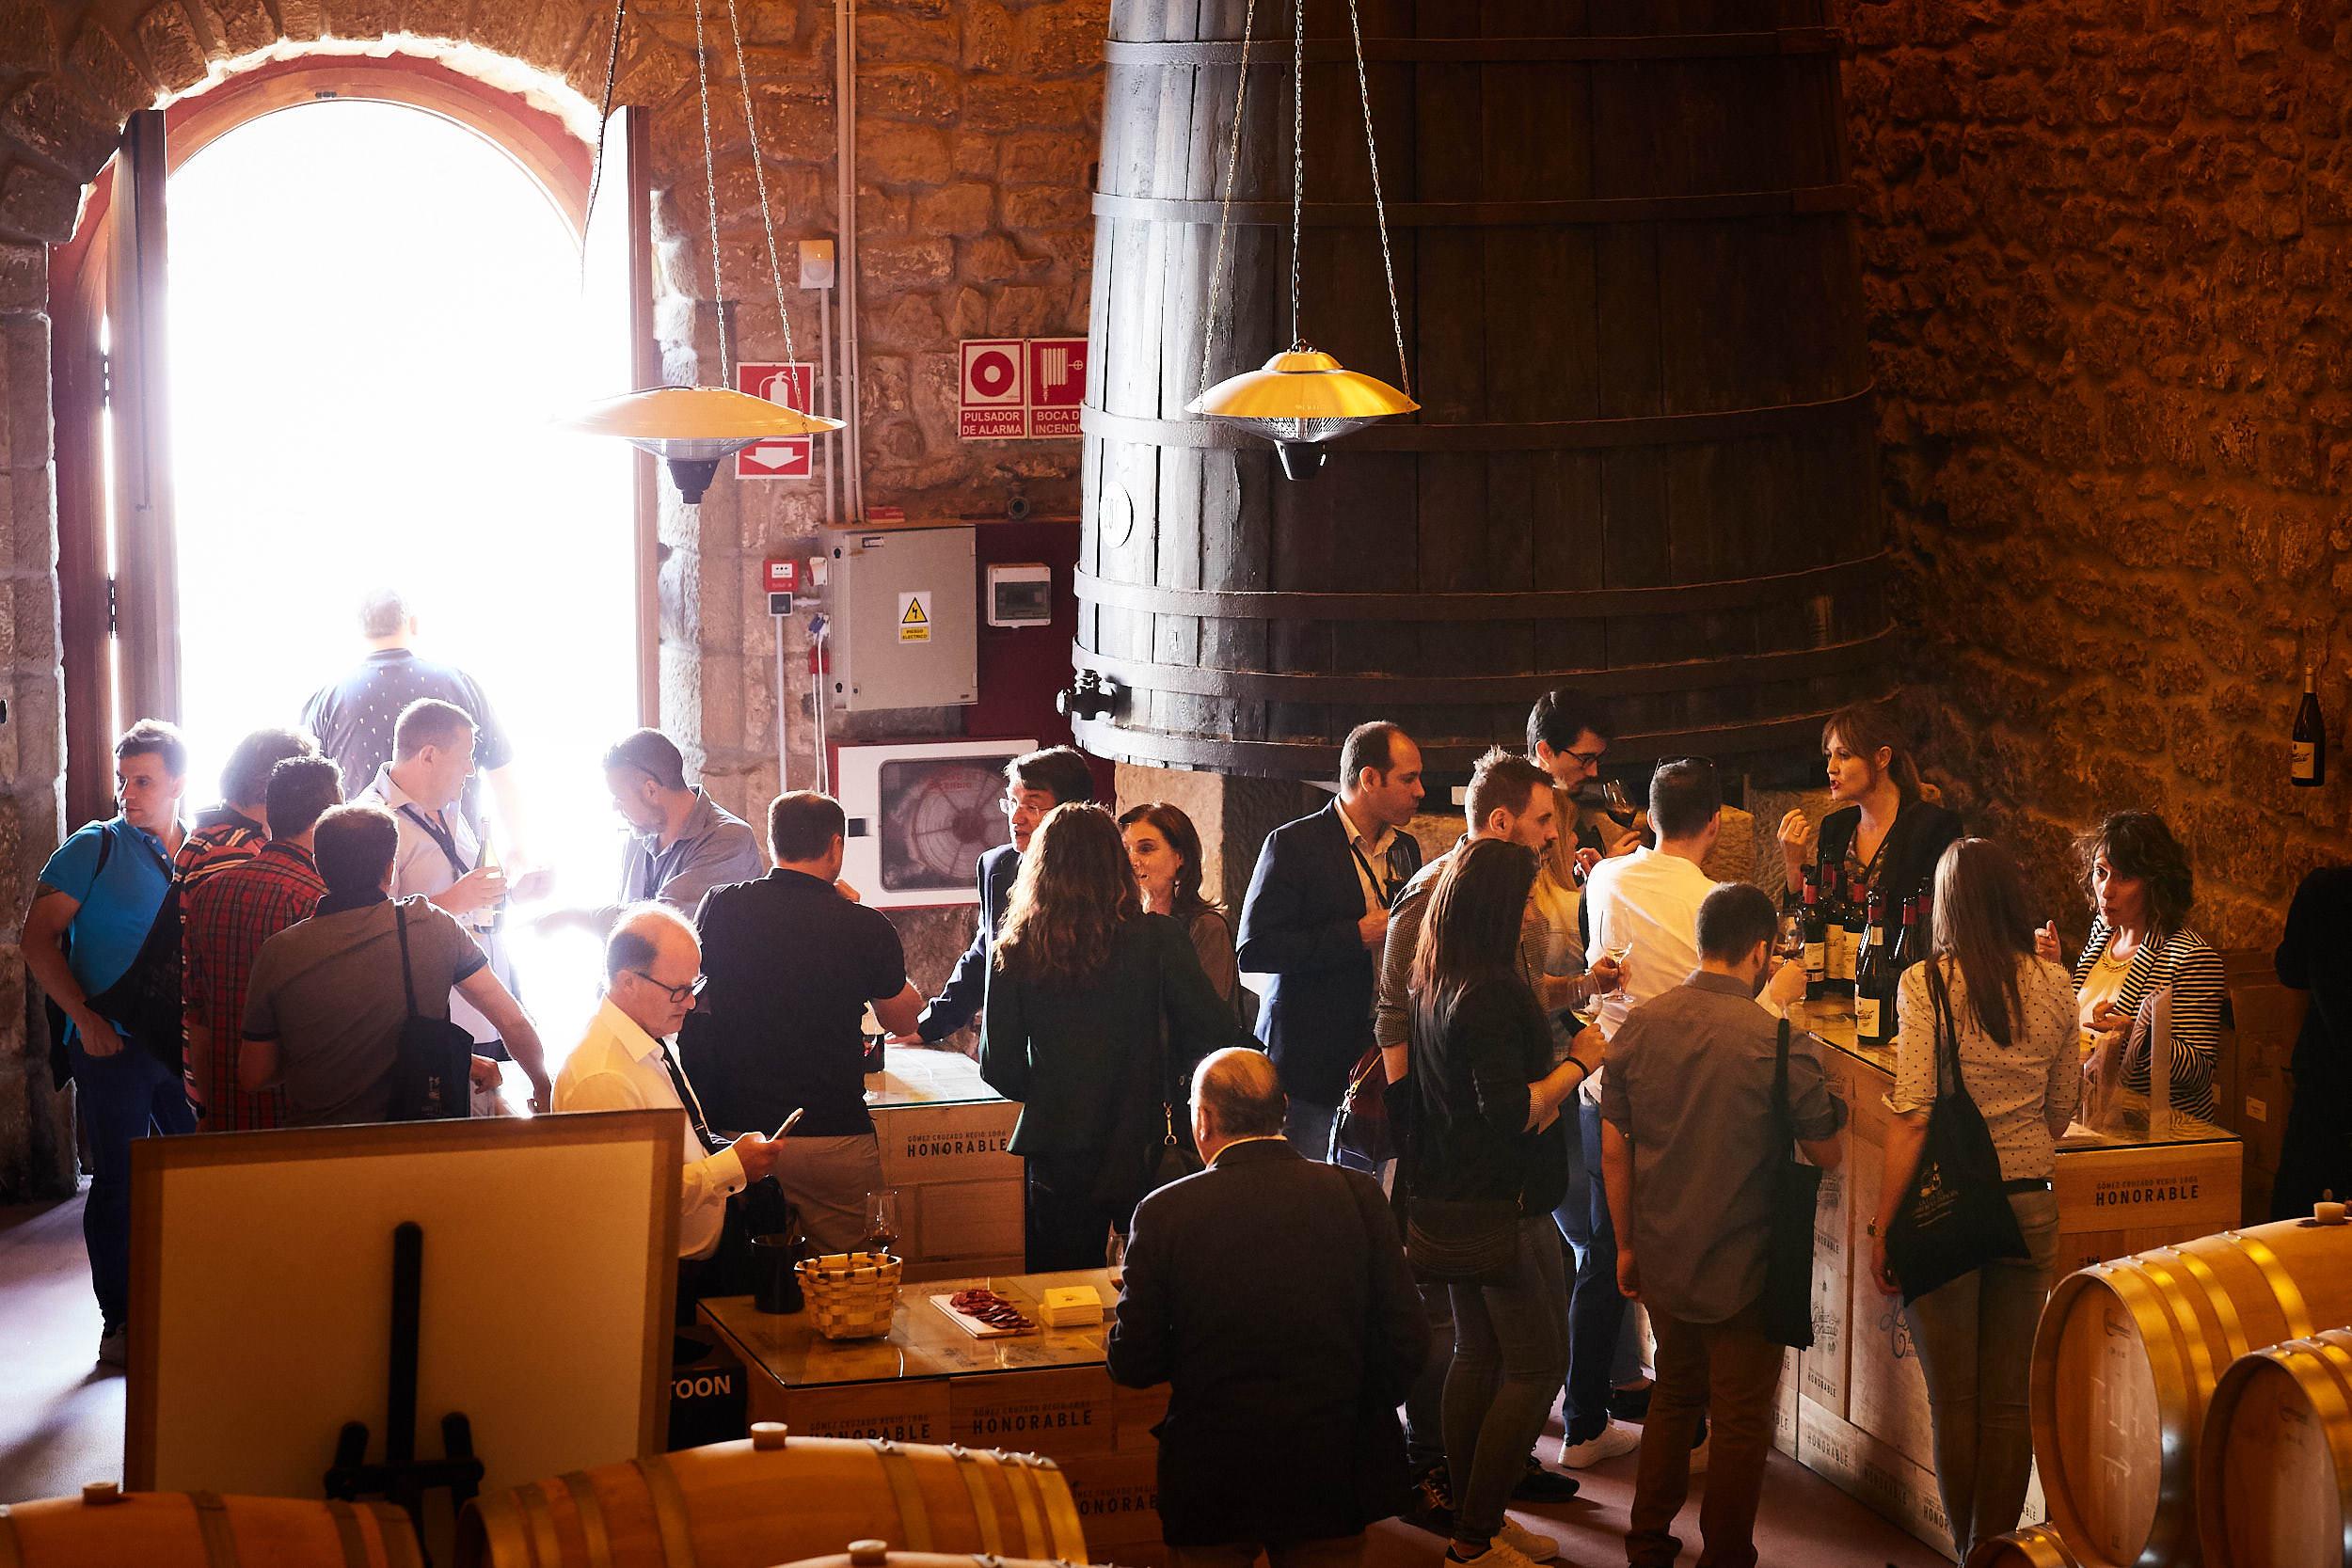 1806Commercial-professional-wine-photography-la-rioja-spain-James-Sturcke_0024.jpg